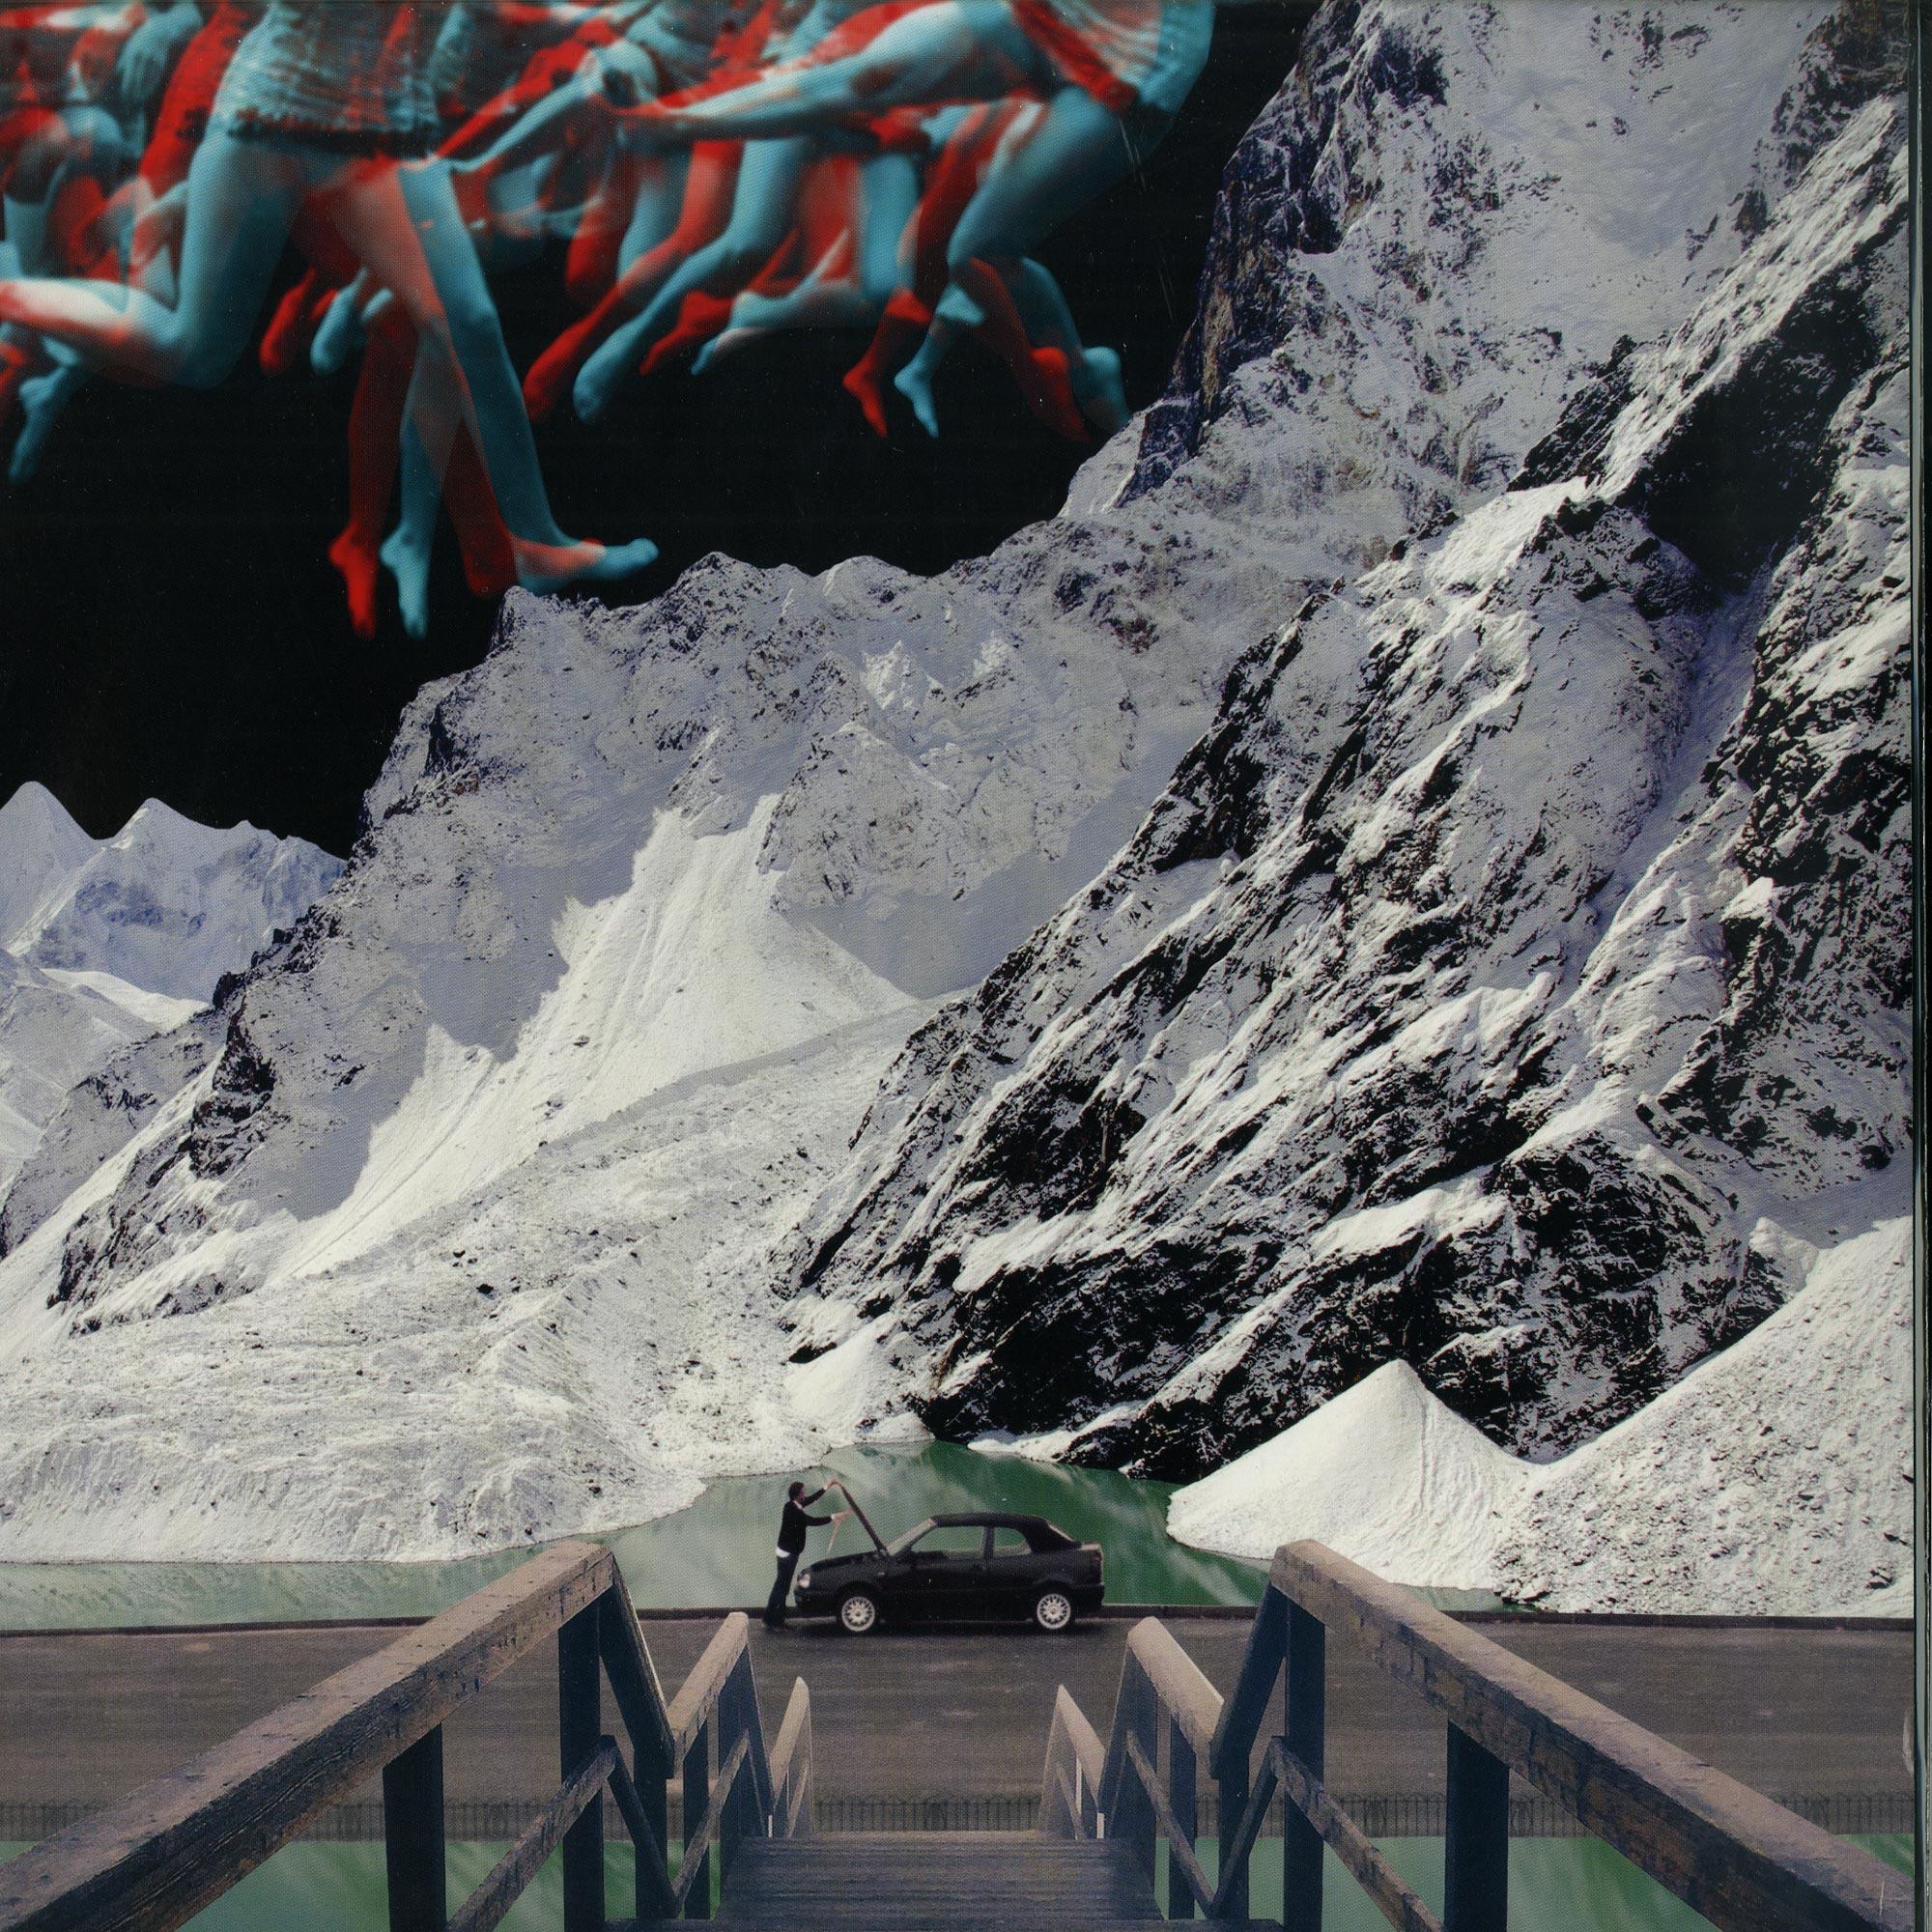 Azimute Feat. Rockey Washington - WE ARE THE SOUND REMIXED